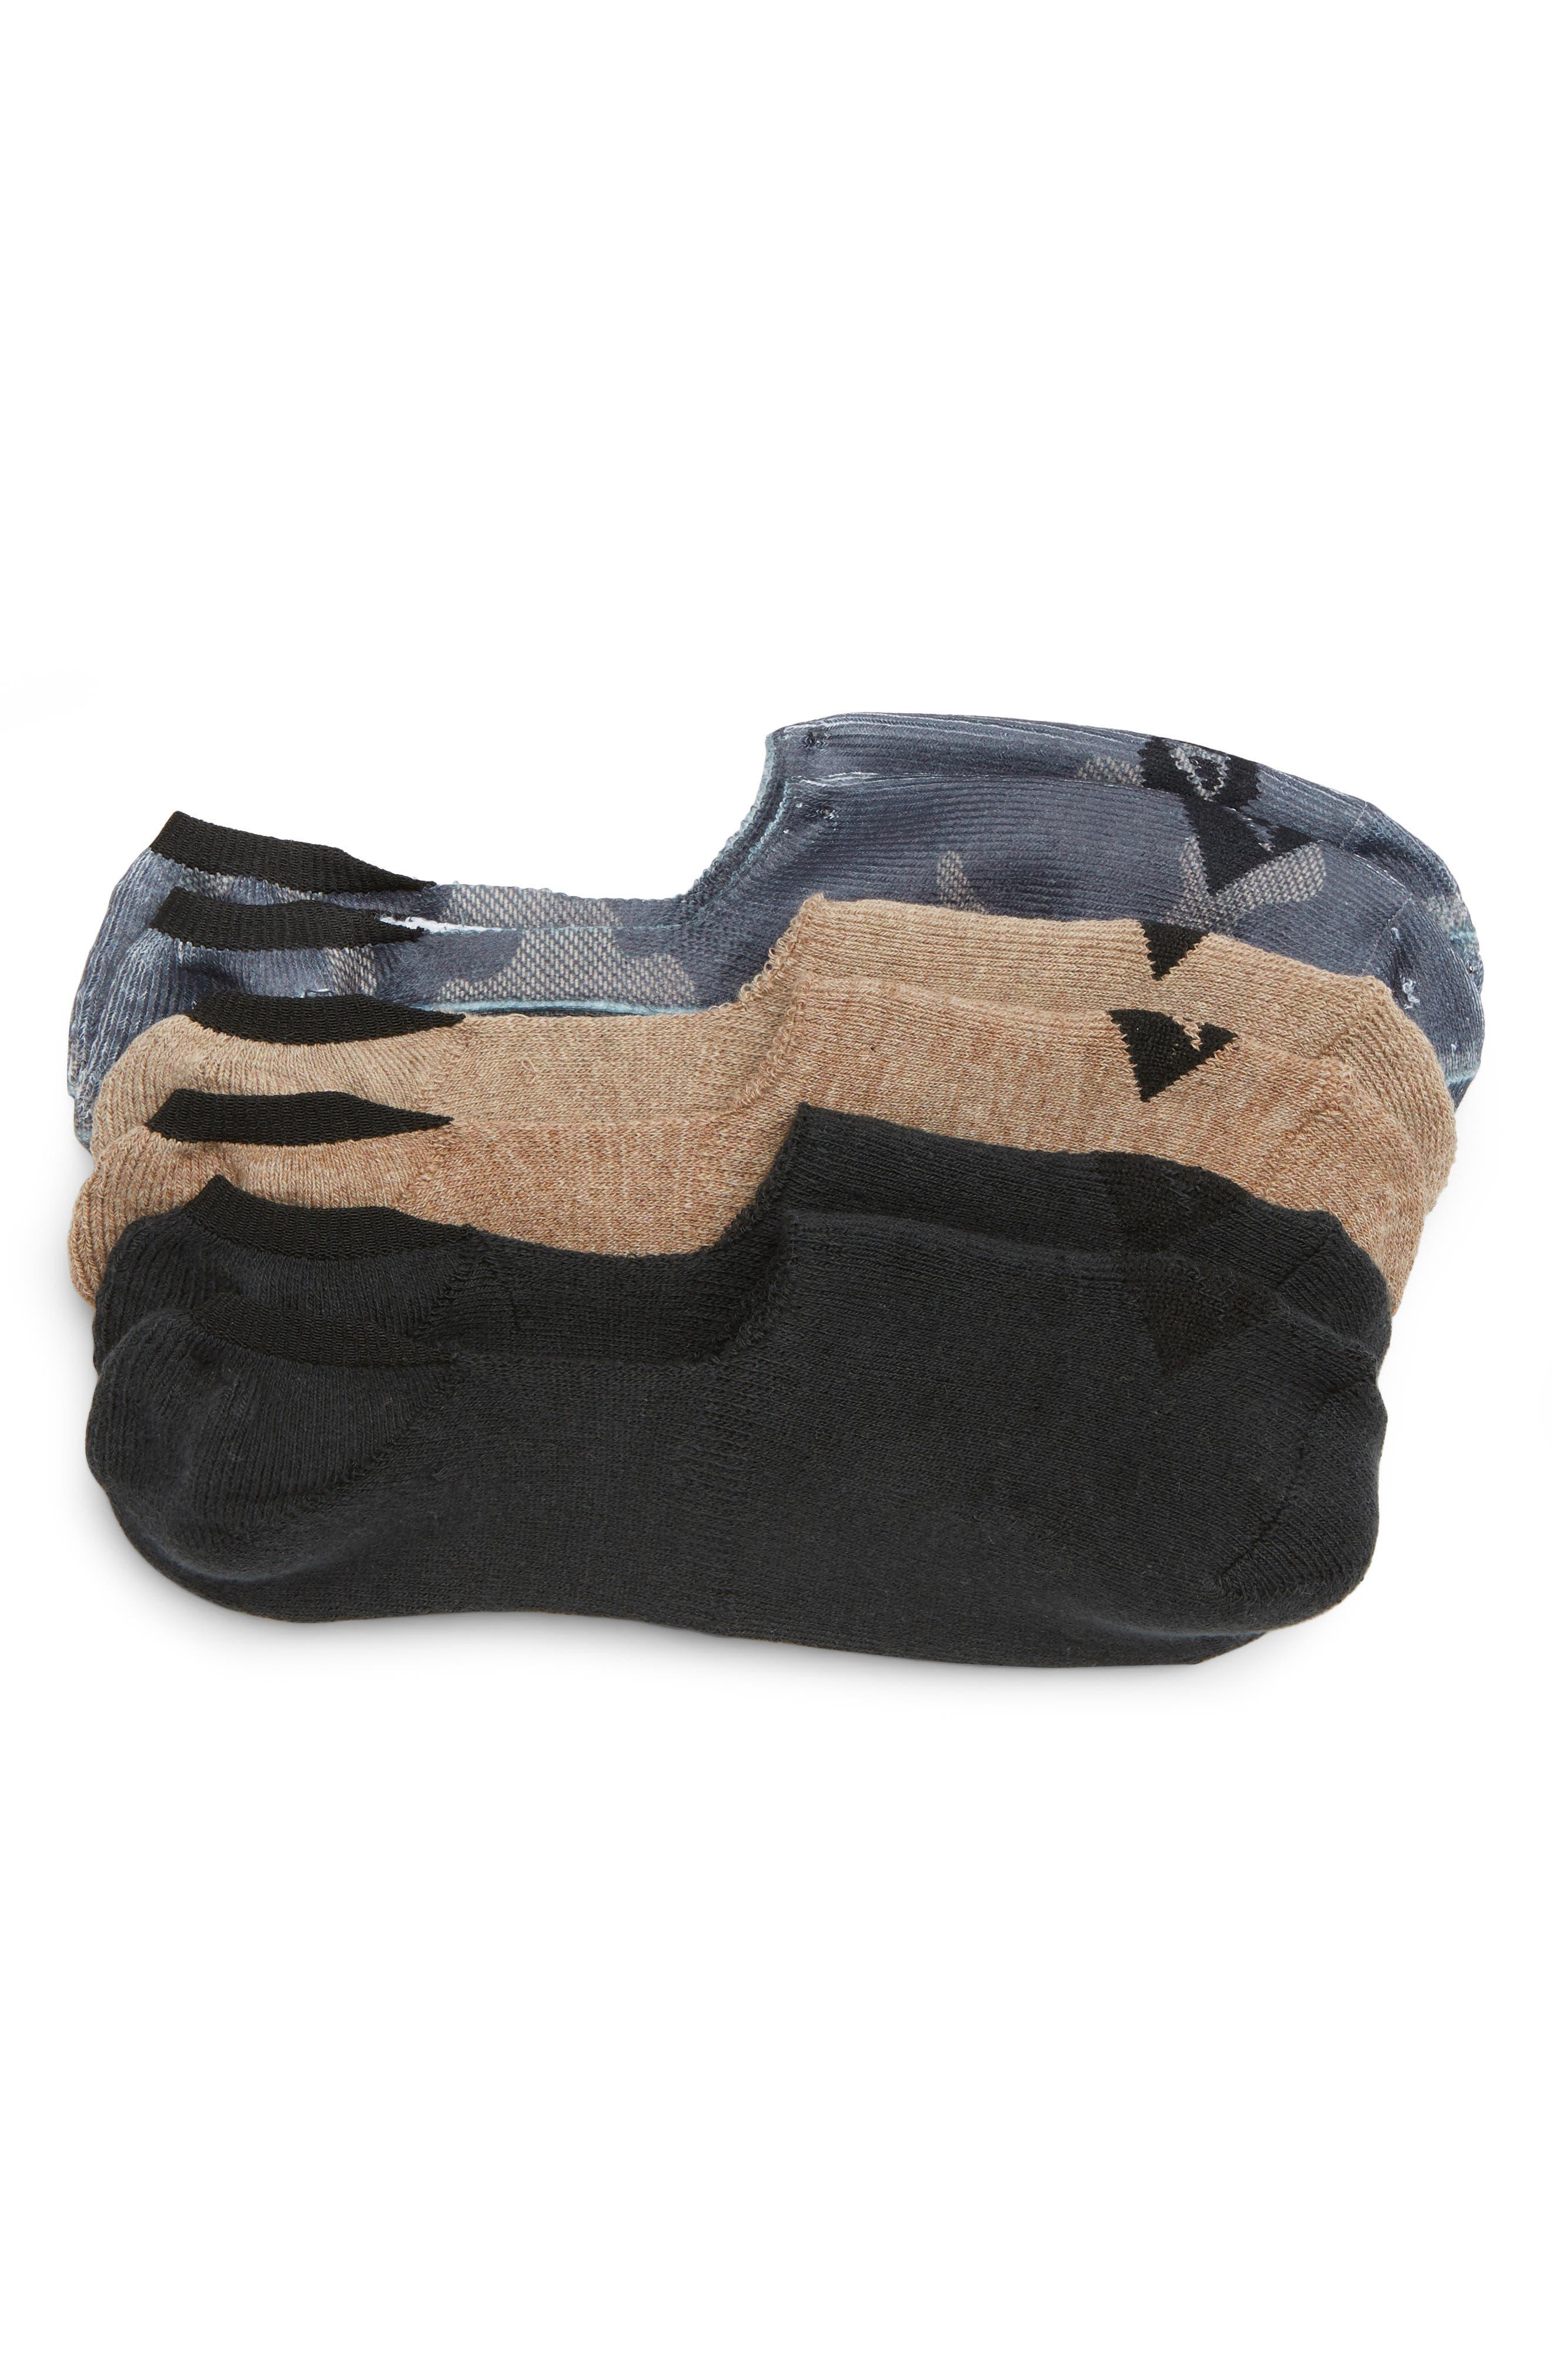 3-Pack Cushion Liner Socks,                         Main,                         color, 206